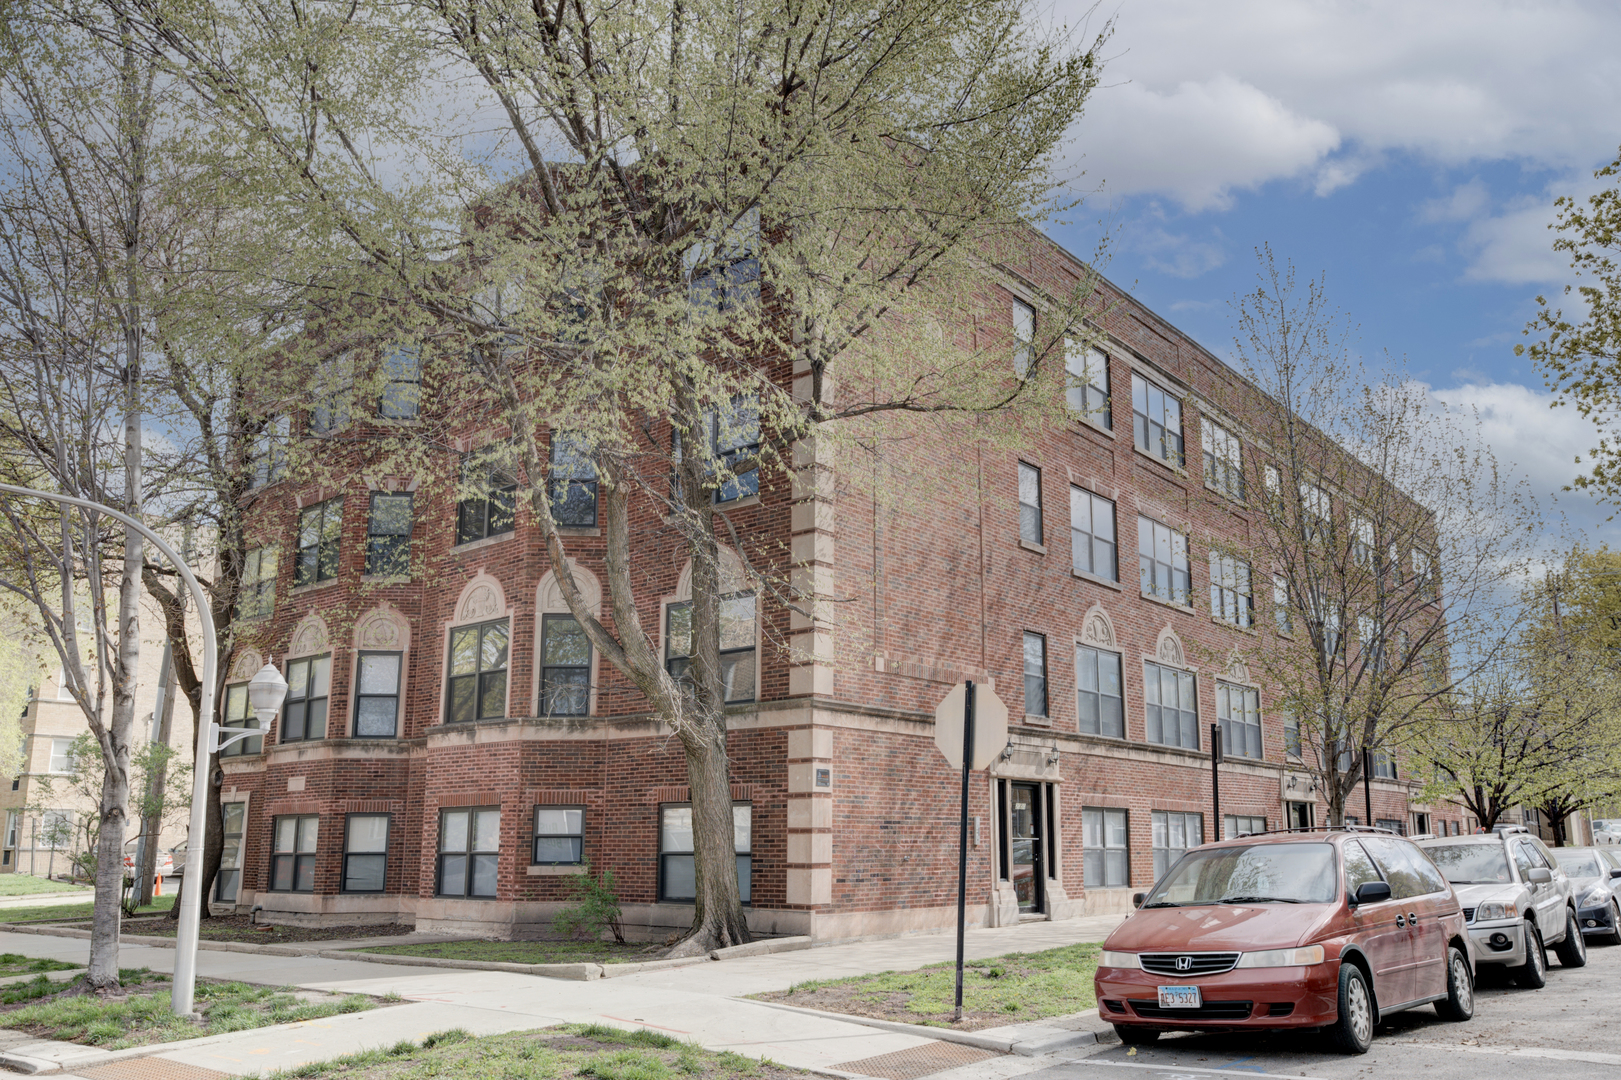 2050 Hood Unit Unit 4b ,Chicago, Illinois 60659